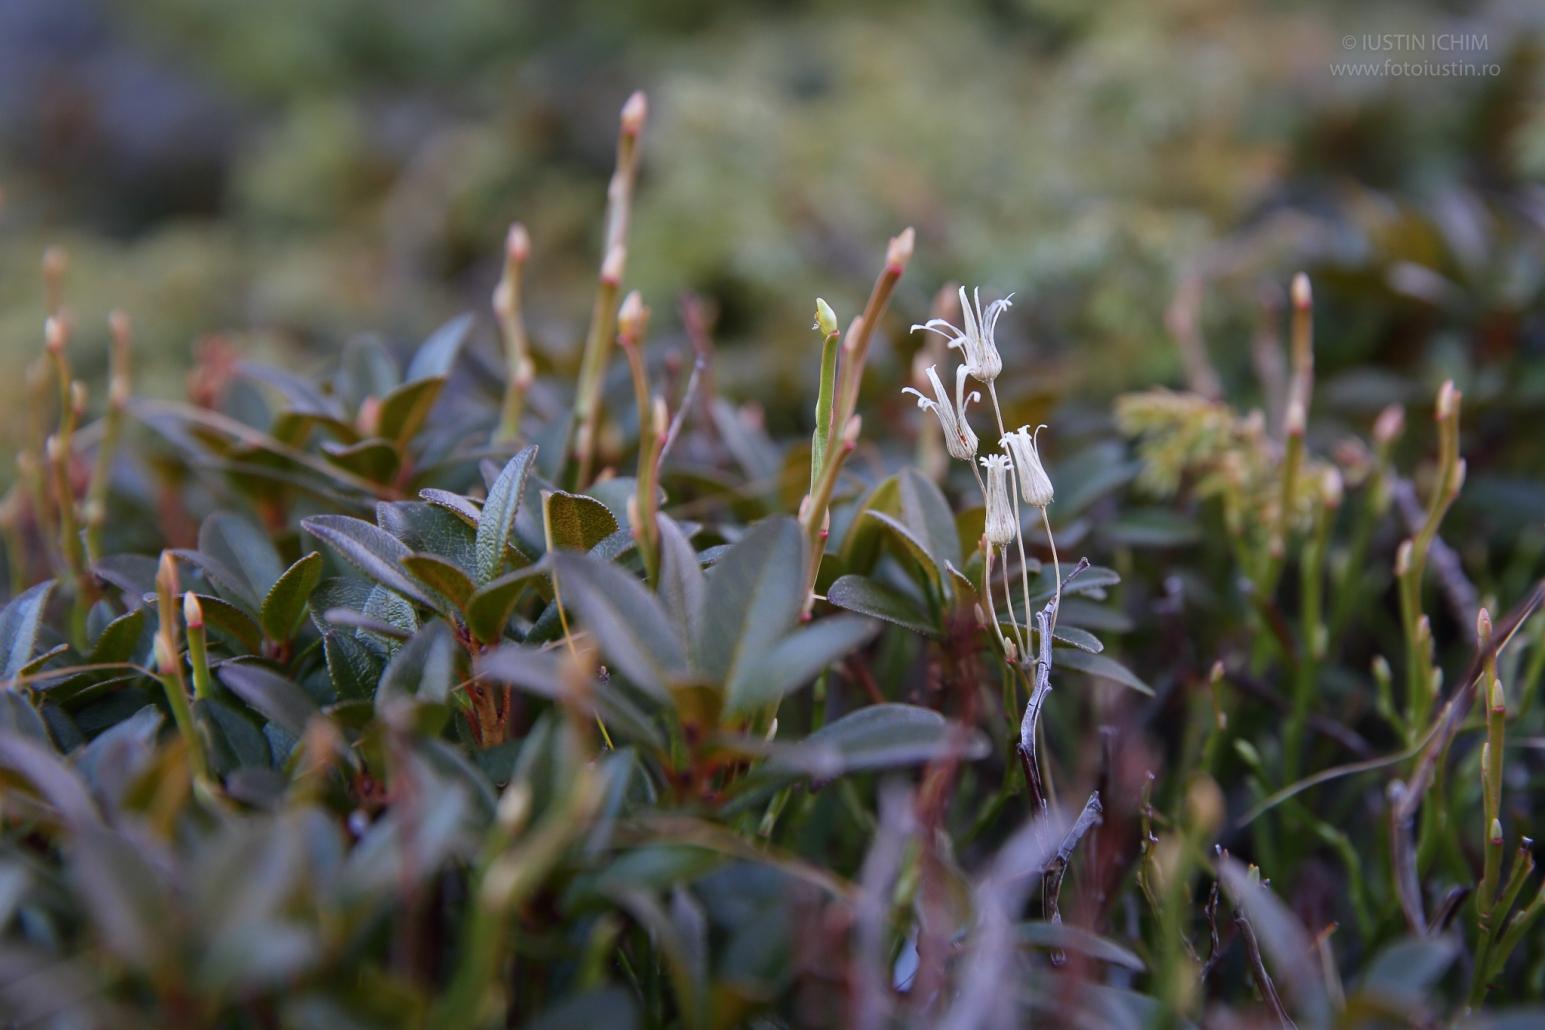 Rhododendron myrtifolium, Smârdarul, Bujorul de munte